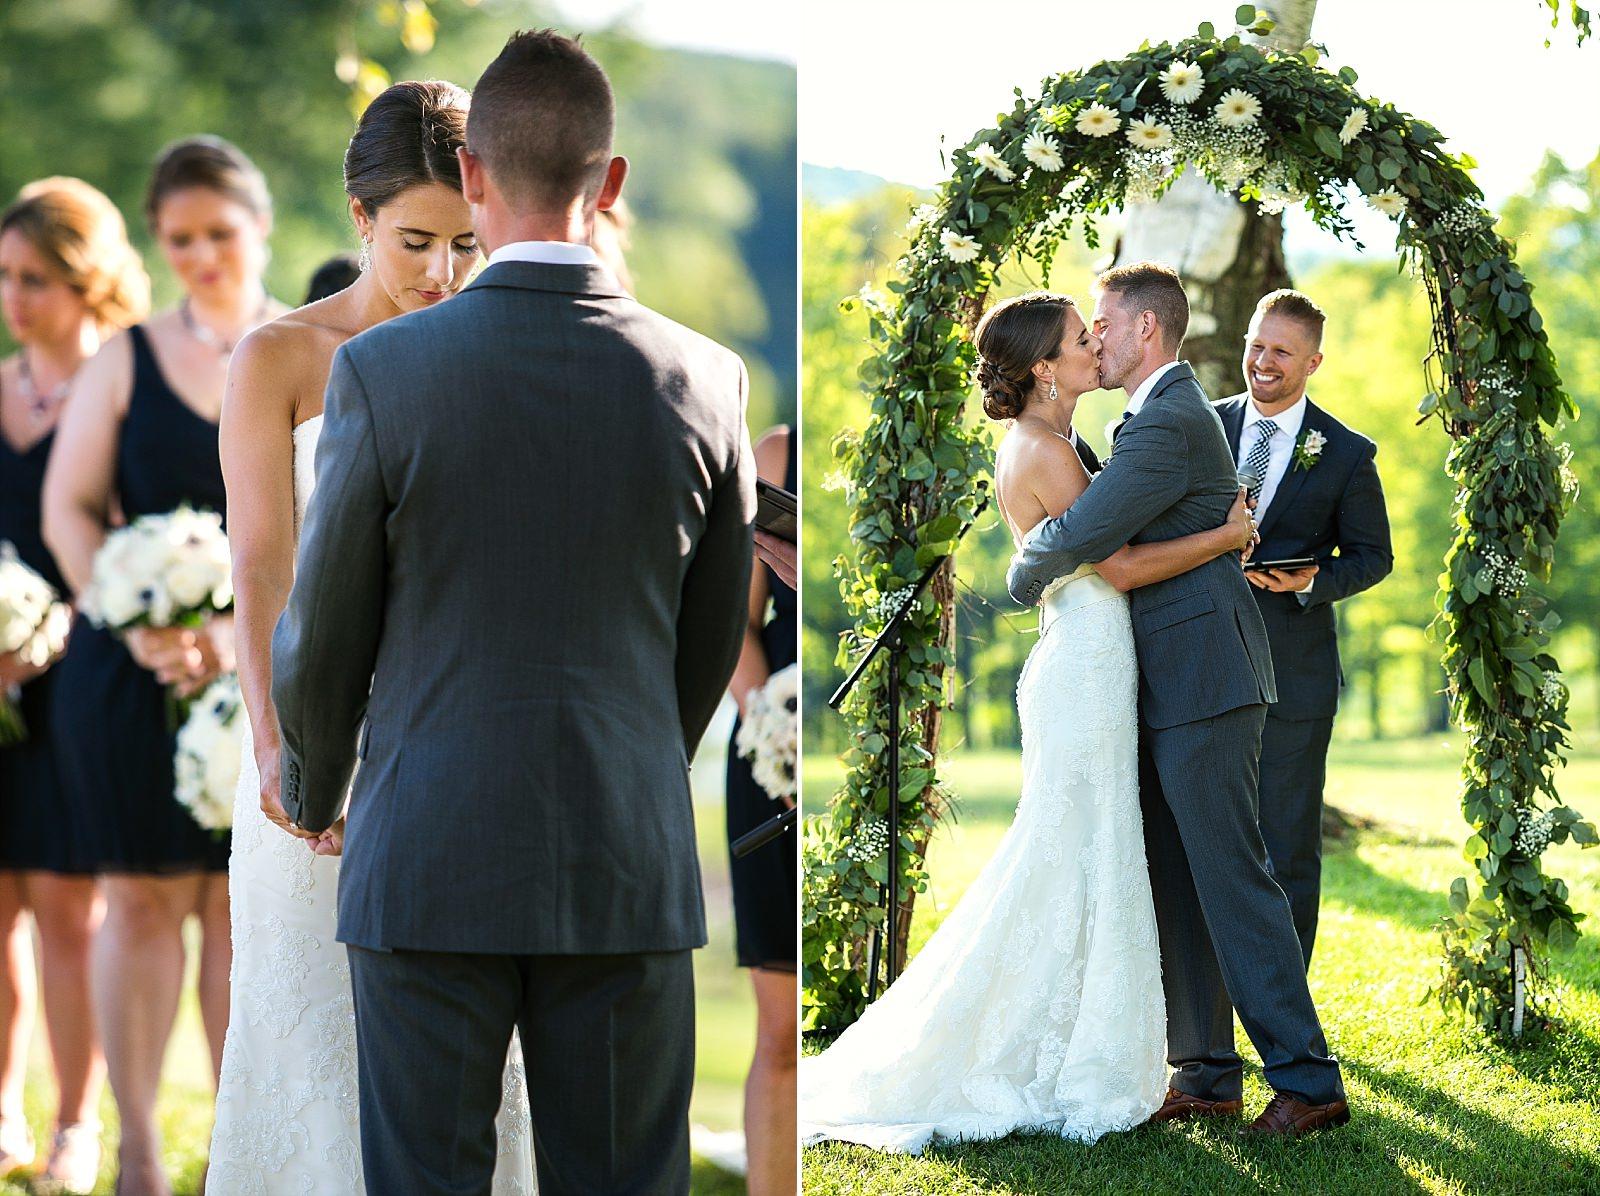 CT_Wedding_Photographer_LiNa_Wed_47.jpg